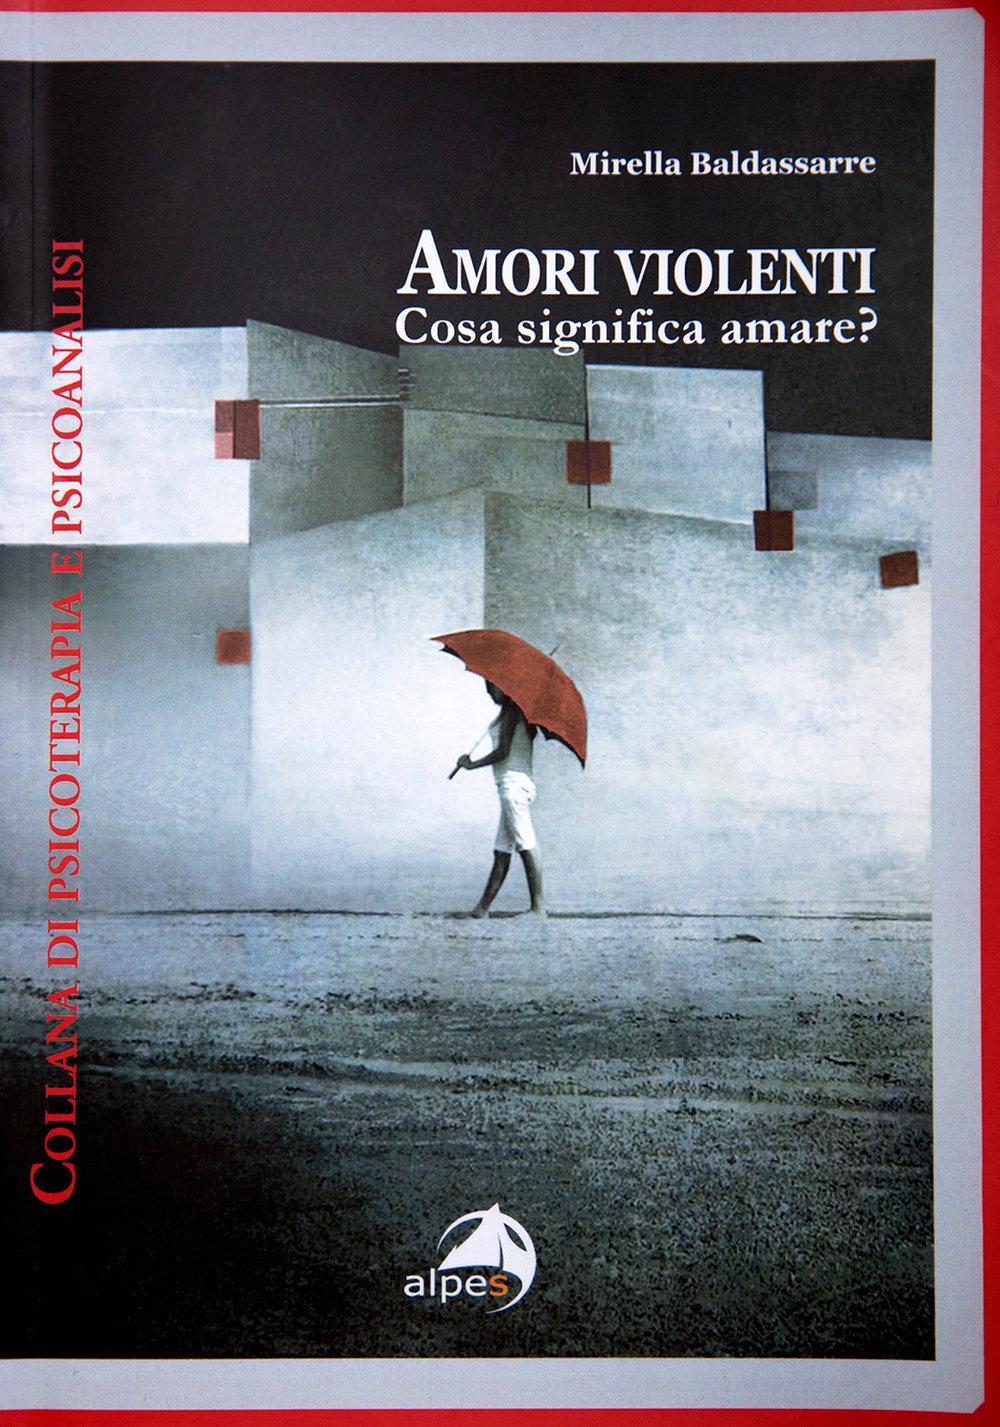 Amori-Violenti.jpg